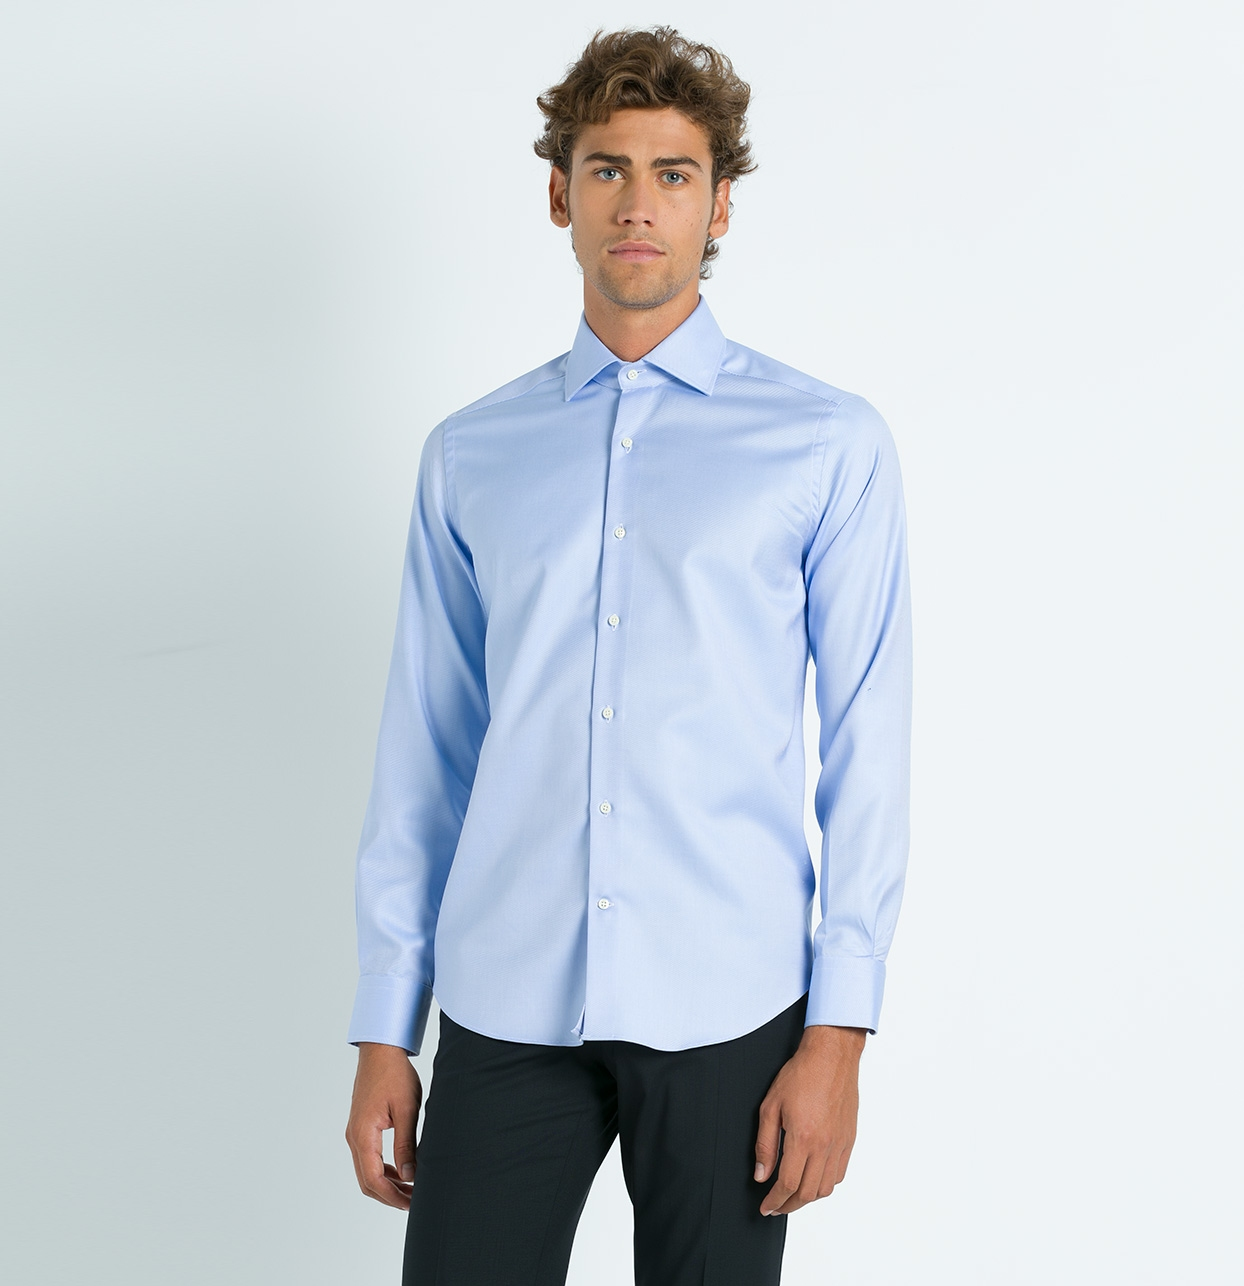 Camisa Formal Wear SLIM FIT cuello italiano modelo ROMA tejido micro dibujo color celeste, 100% Algodón. - Ítem3